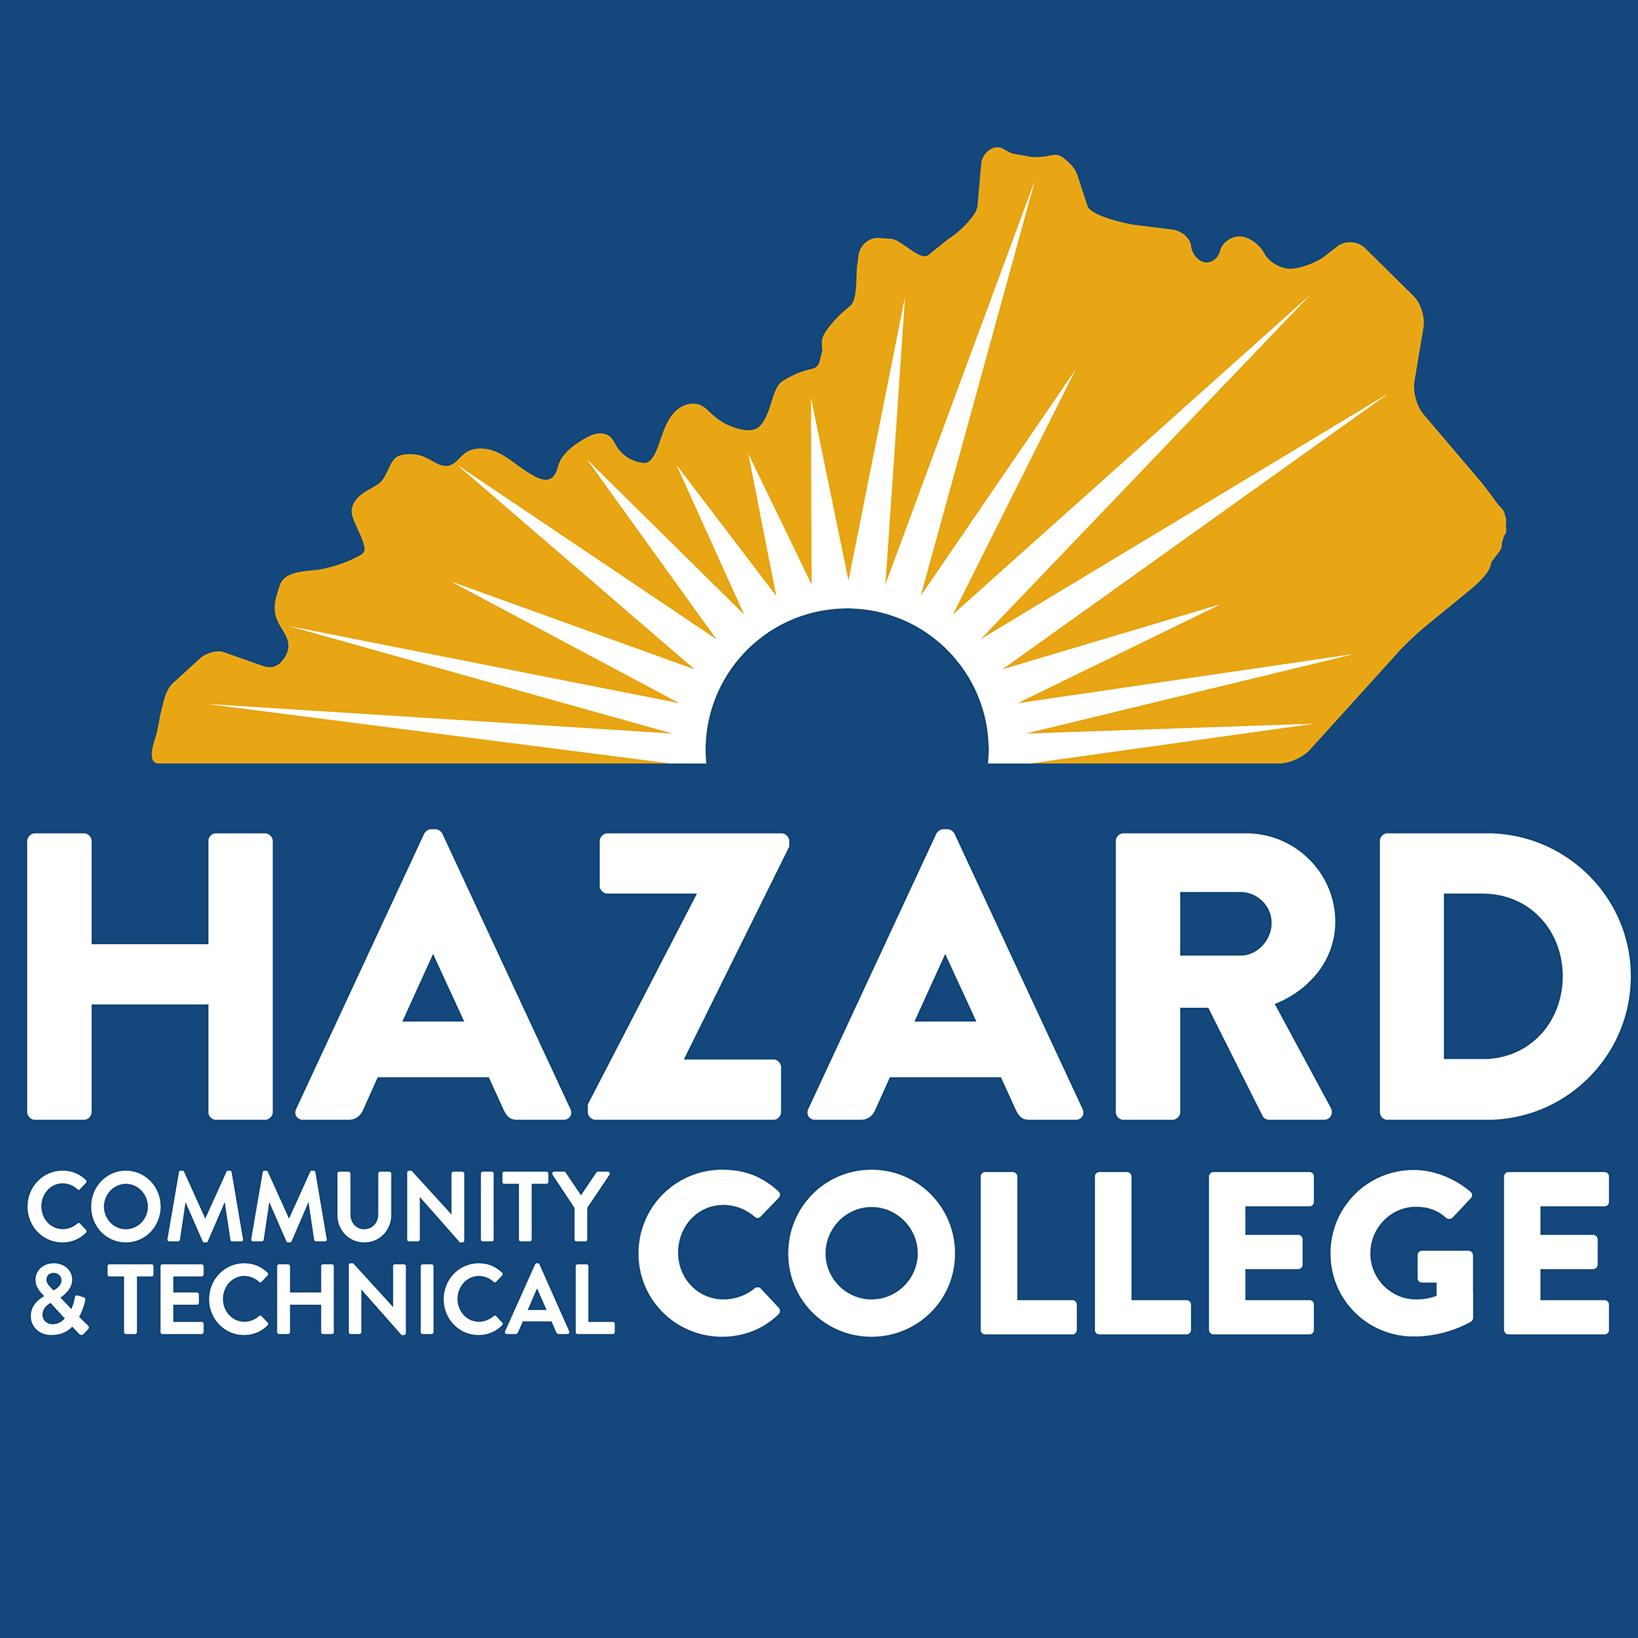 Hazard Community & Technical College